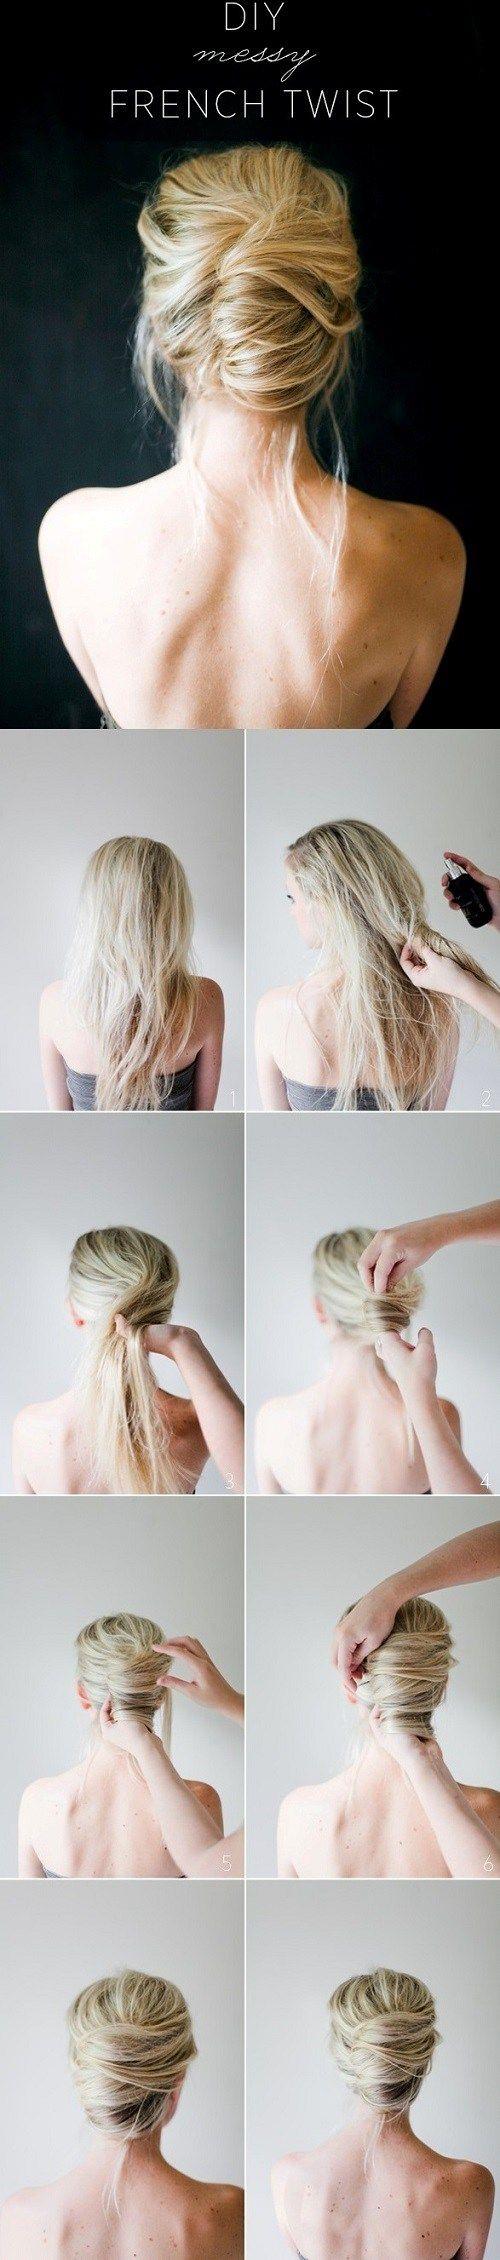 How To - Messy French Twist - From Irrelephant Blog :: @irrelephantblog :: | Glamour Shots Photography